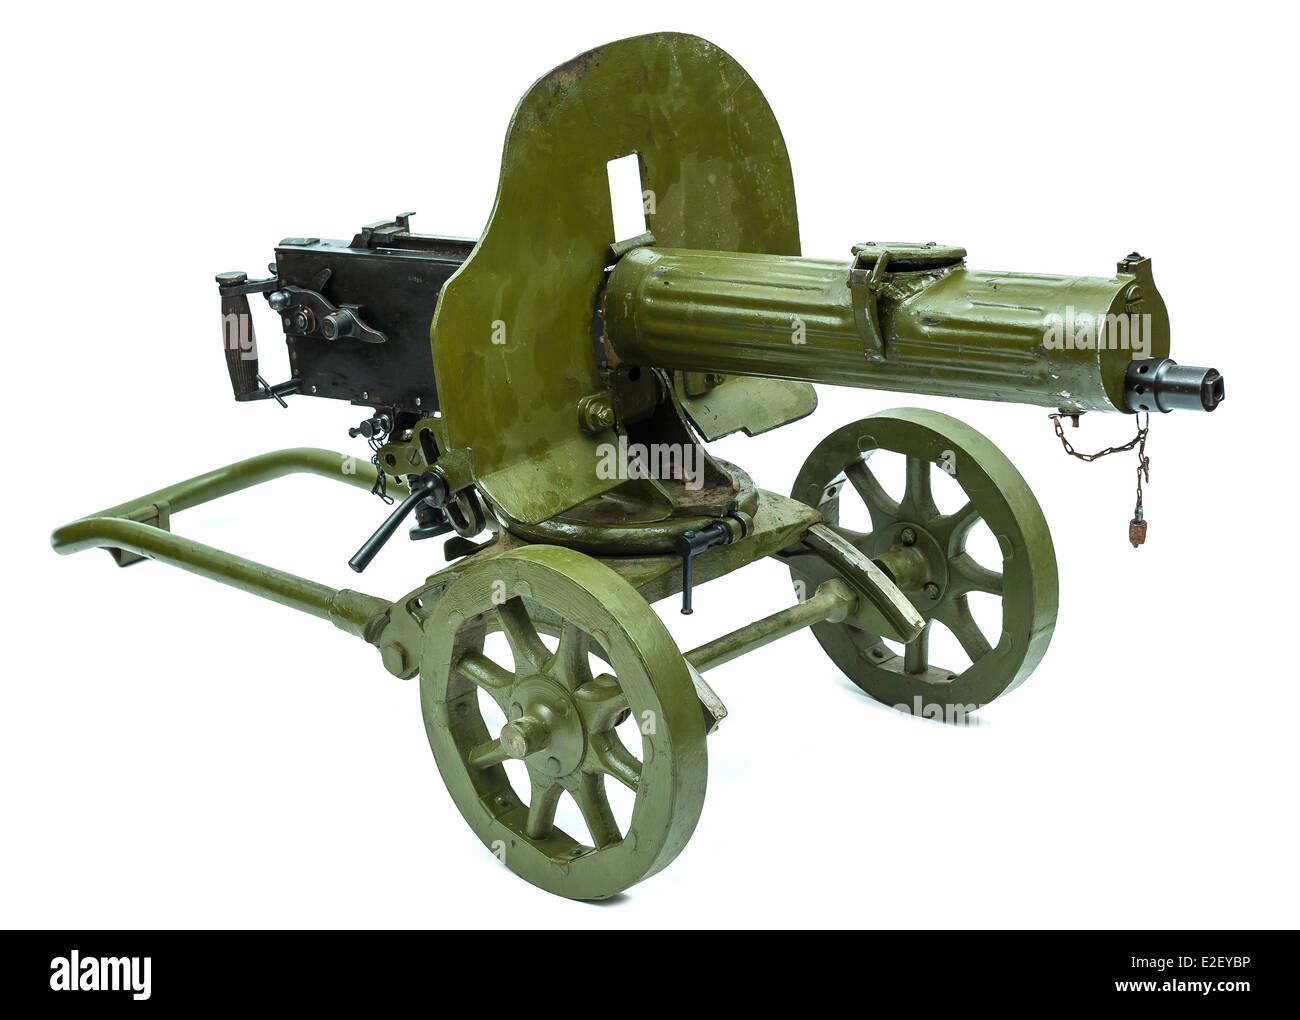 Russian World War Two Maxim heavy machine gun on wheels - Stock Image